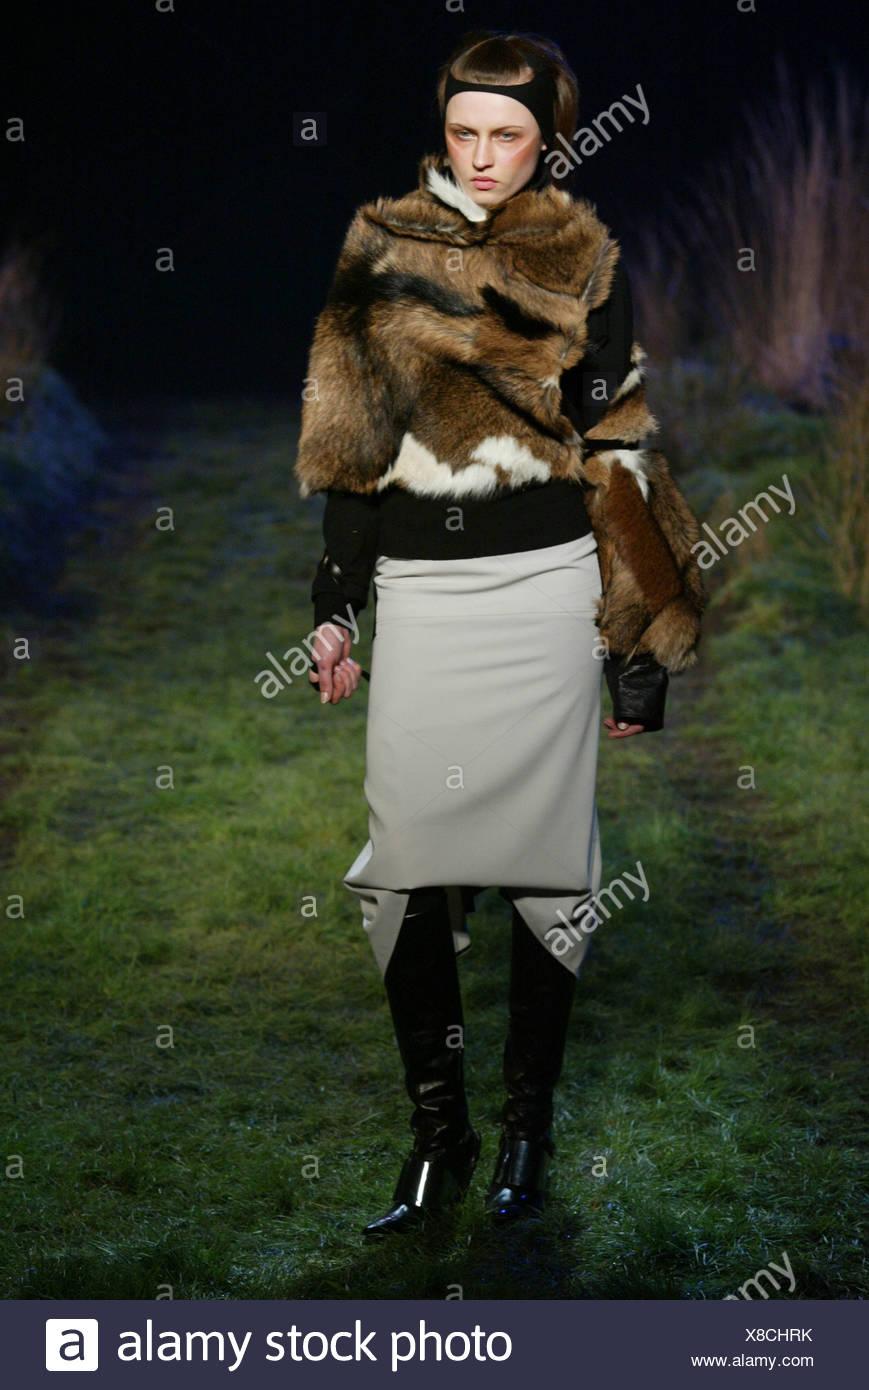 Black Knee High Fur Boots Immagini   Black Knee High Fur Boots Fotos ... b53519e5b23